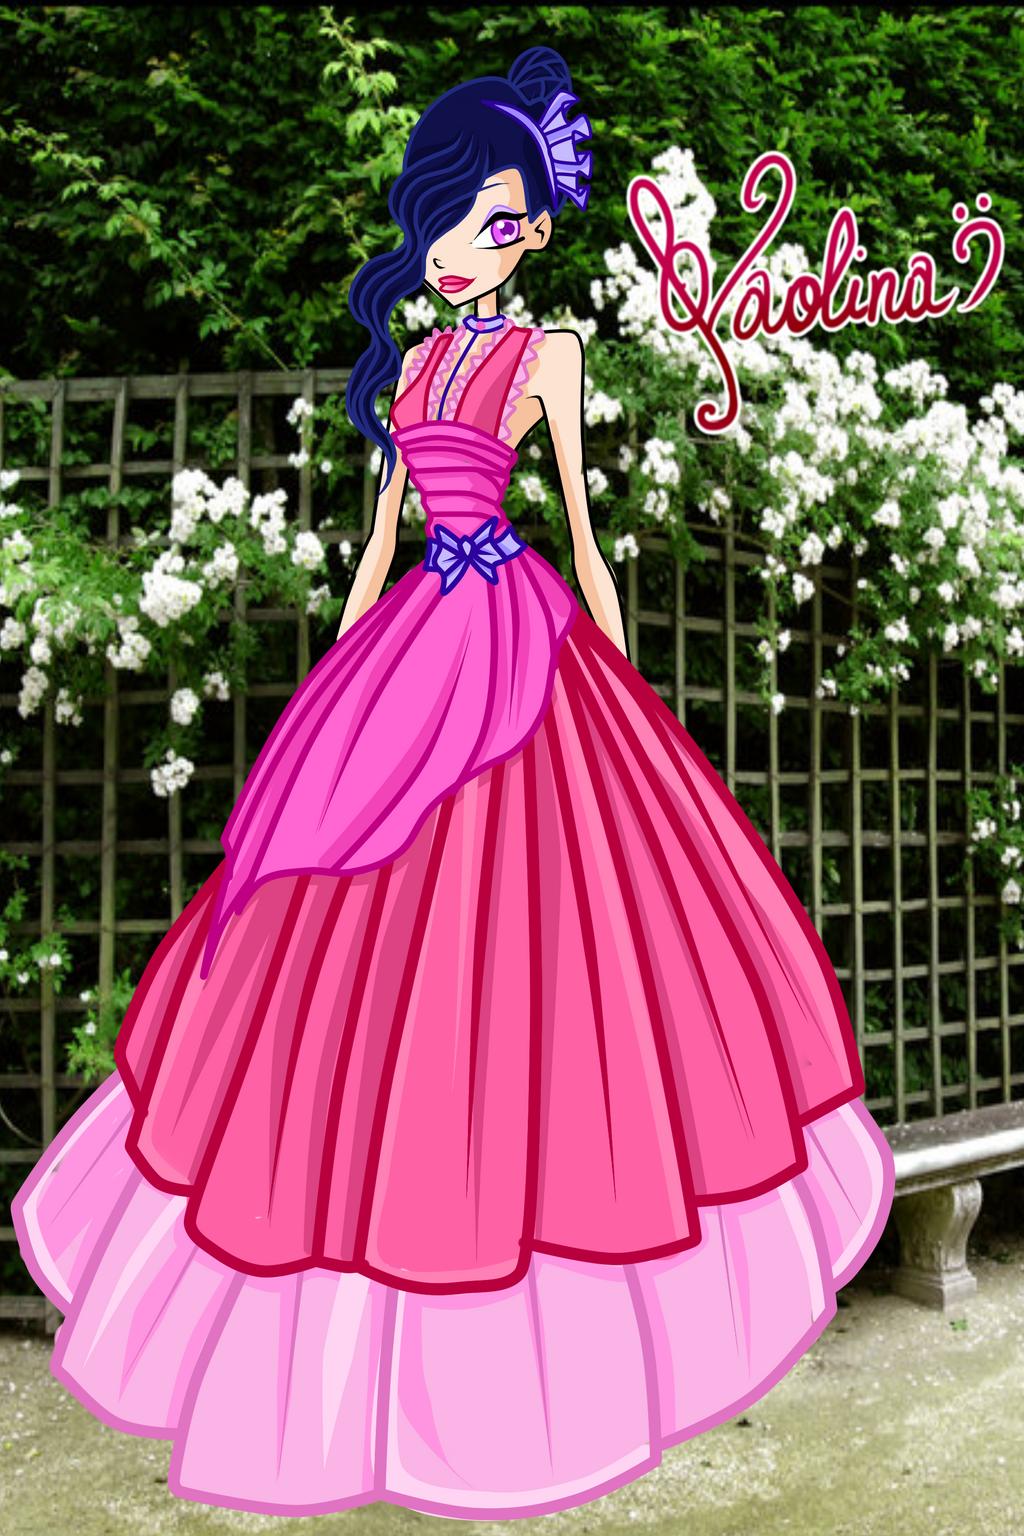 Winx vaolina princess by caboulla on deviantart - Princesse winx ...